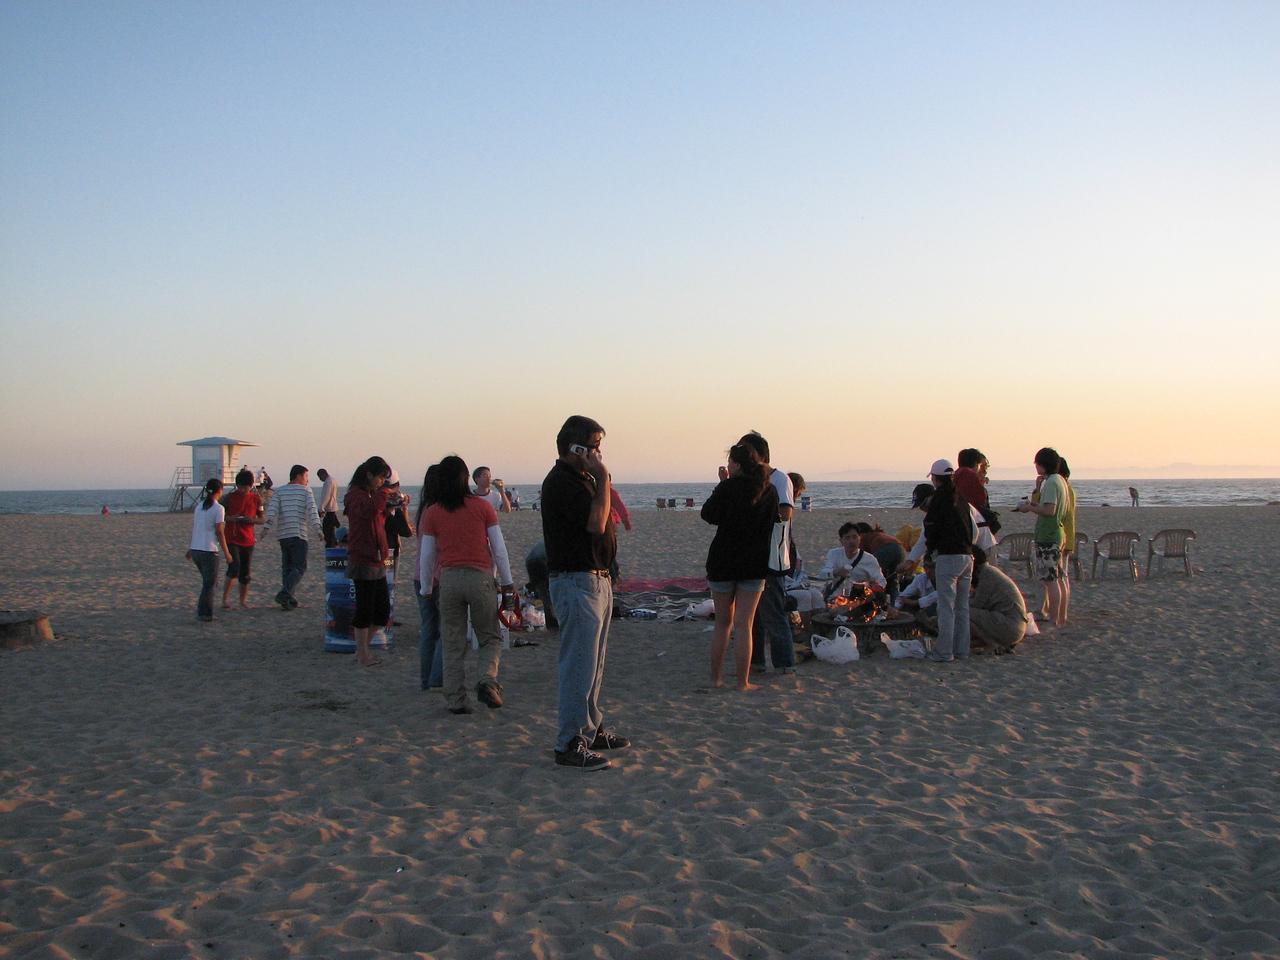 2008 03 24 Mon - Talbot & Int'l students @ the beach - Chillin'